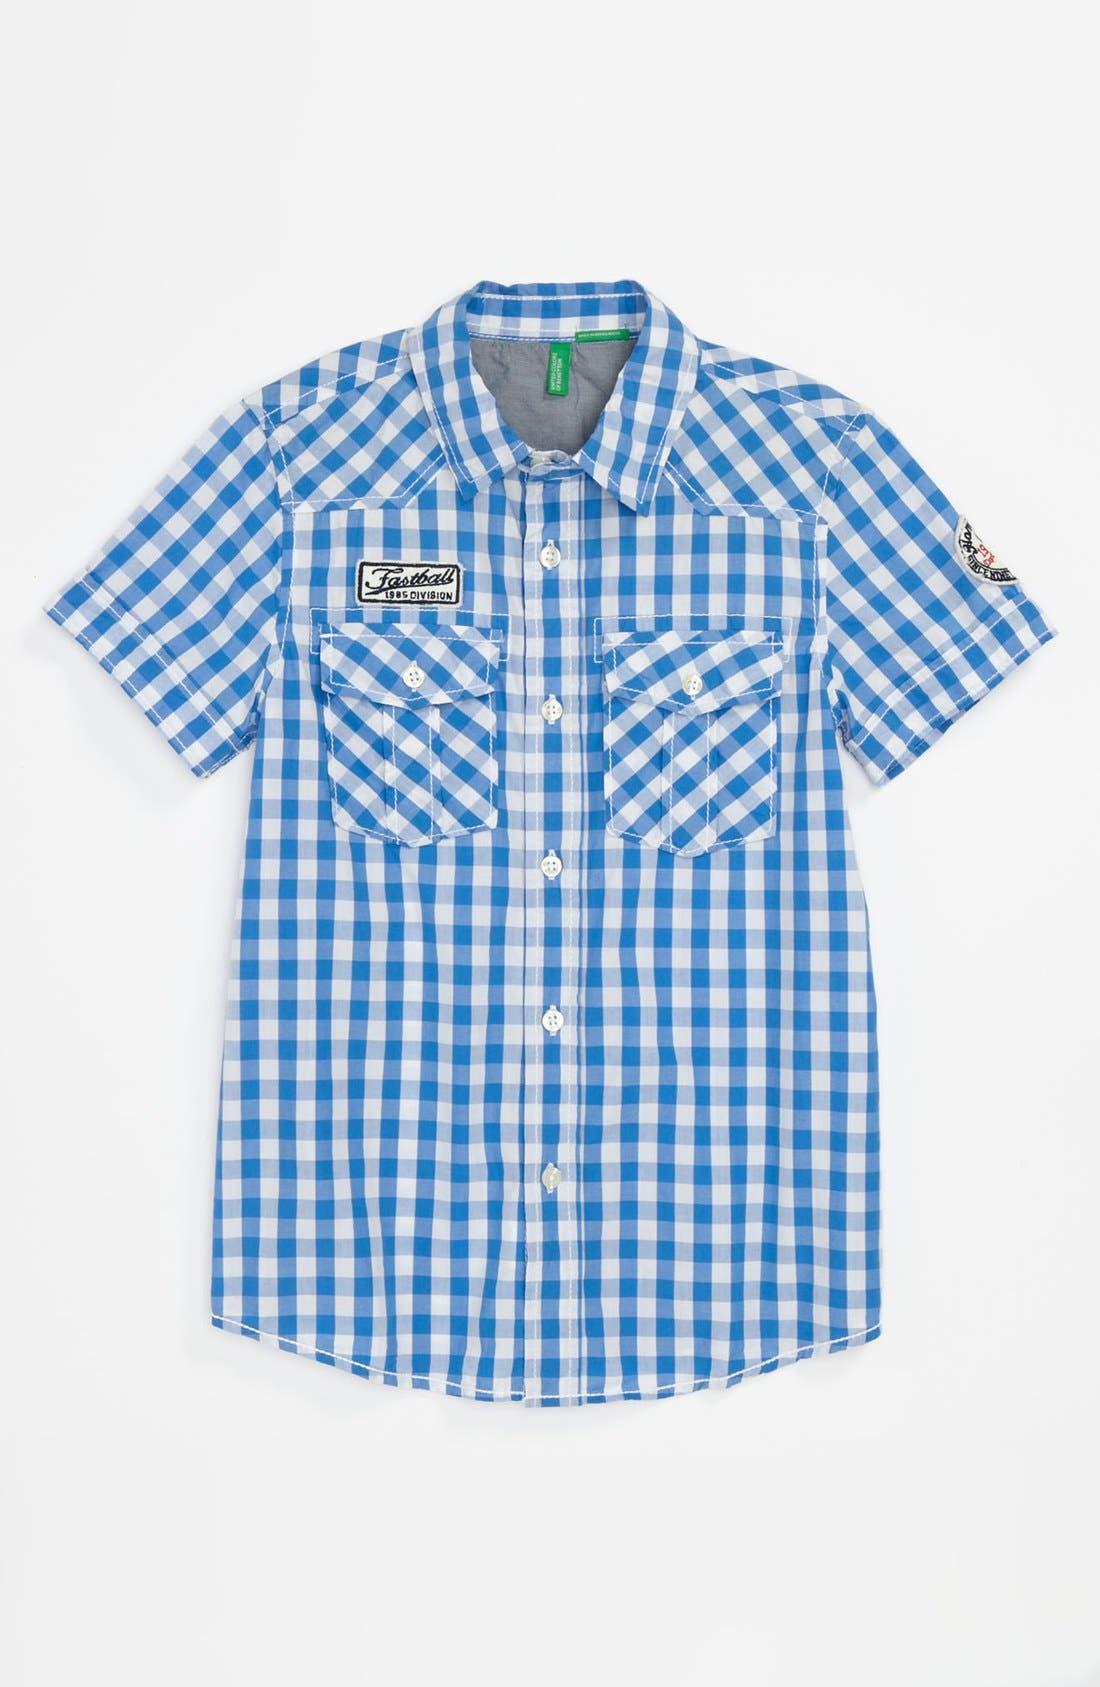 Alternate Image 1 Selected - United Colors of Benetton Kids Gingham Shirt (Big Boys)